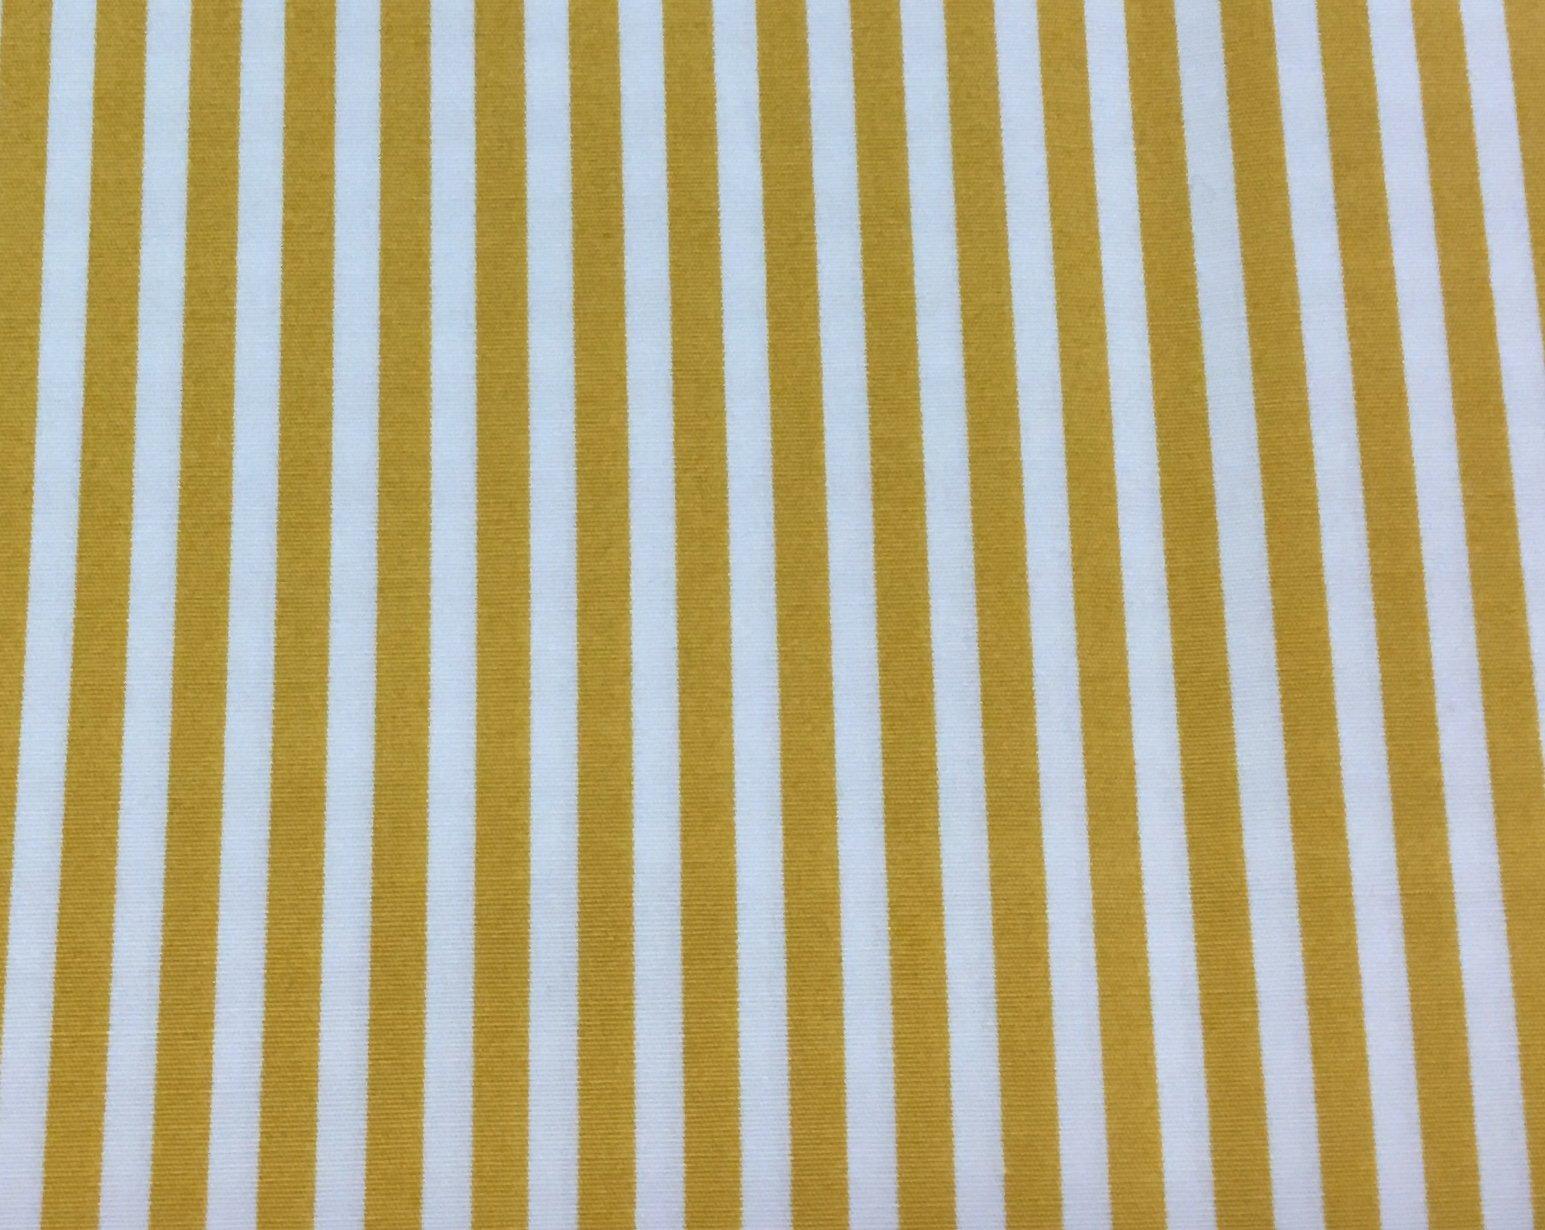 Forage - Goldenrod stripe